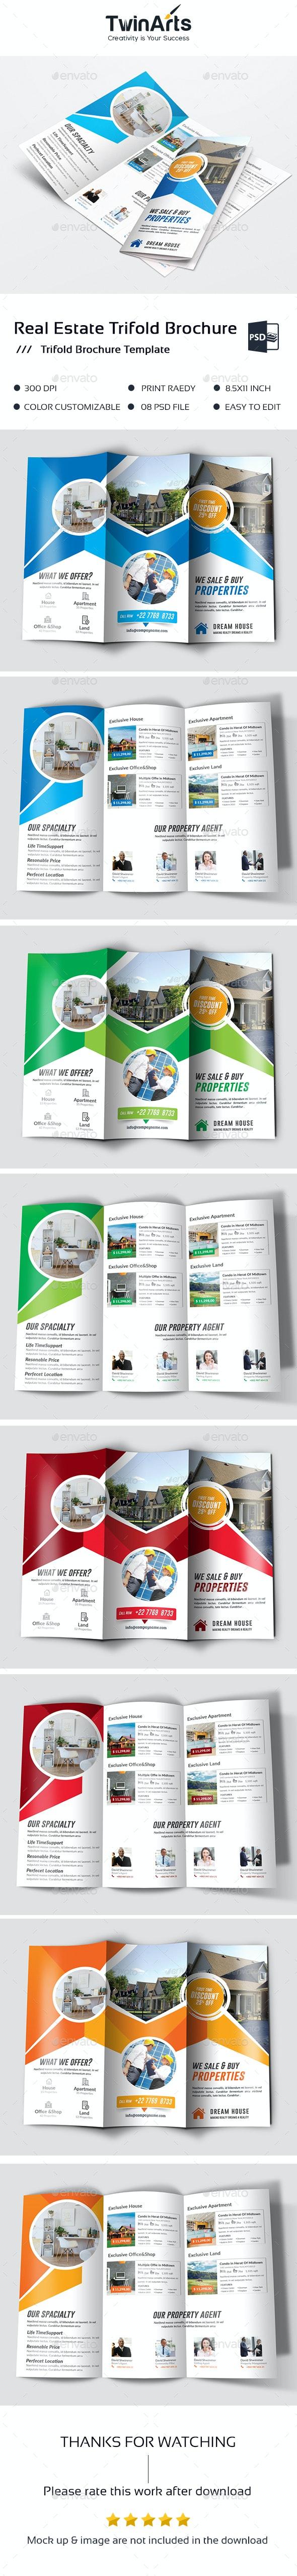 Real Estate Trifold Brochure - Brochures Print Templates